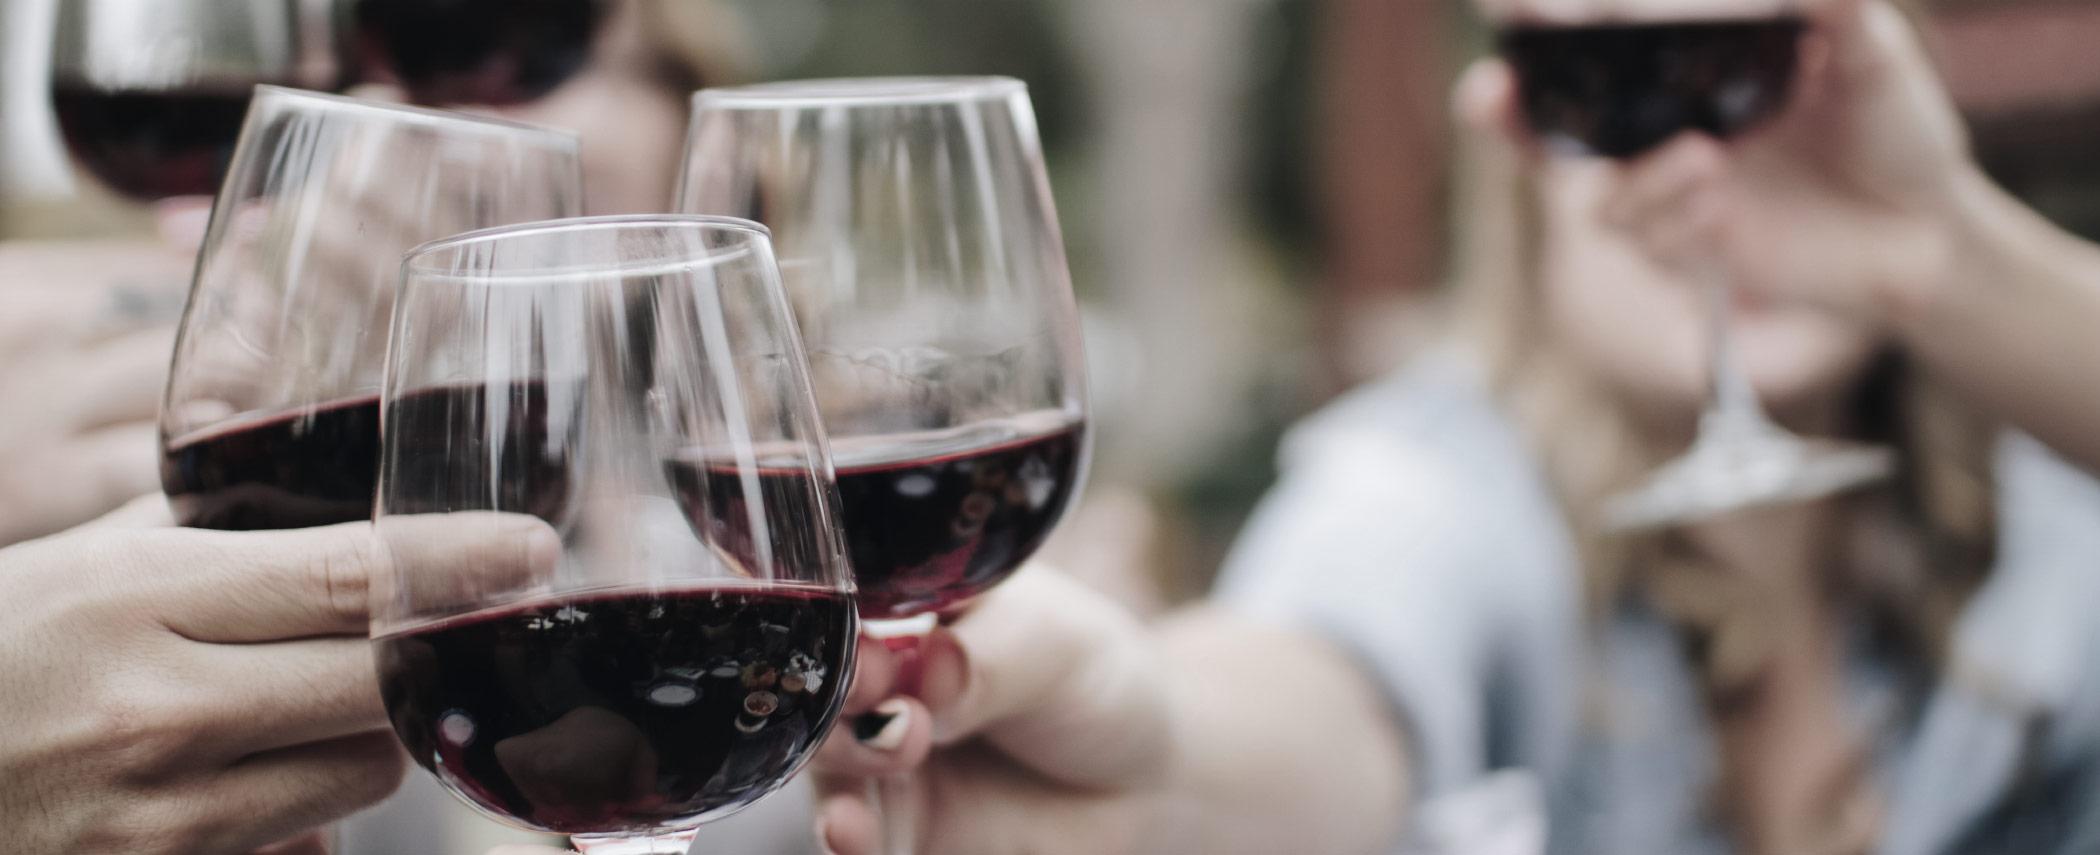 group of people enjoying red wine